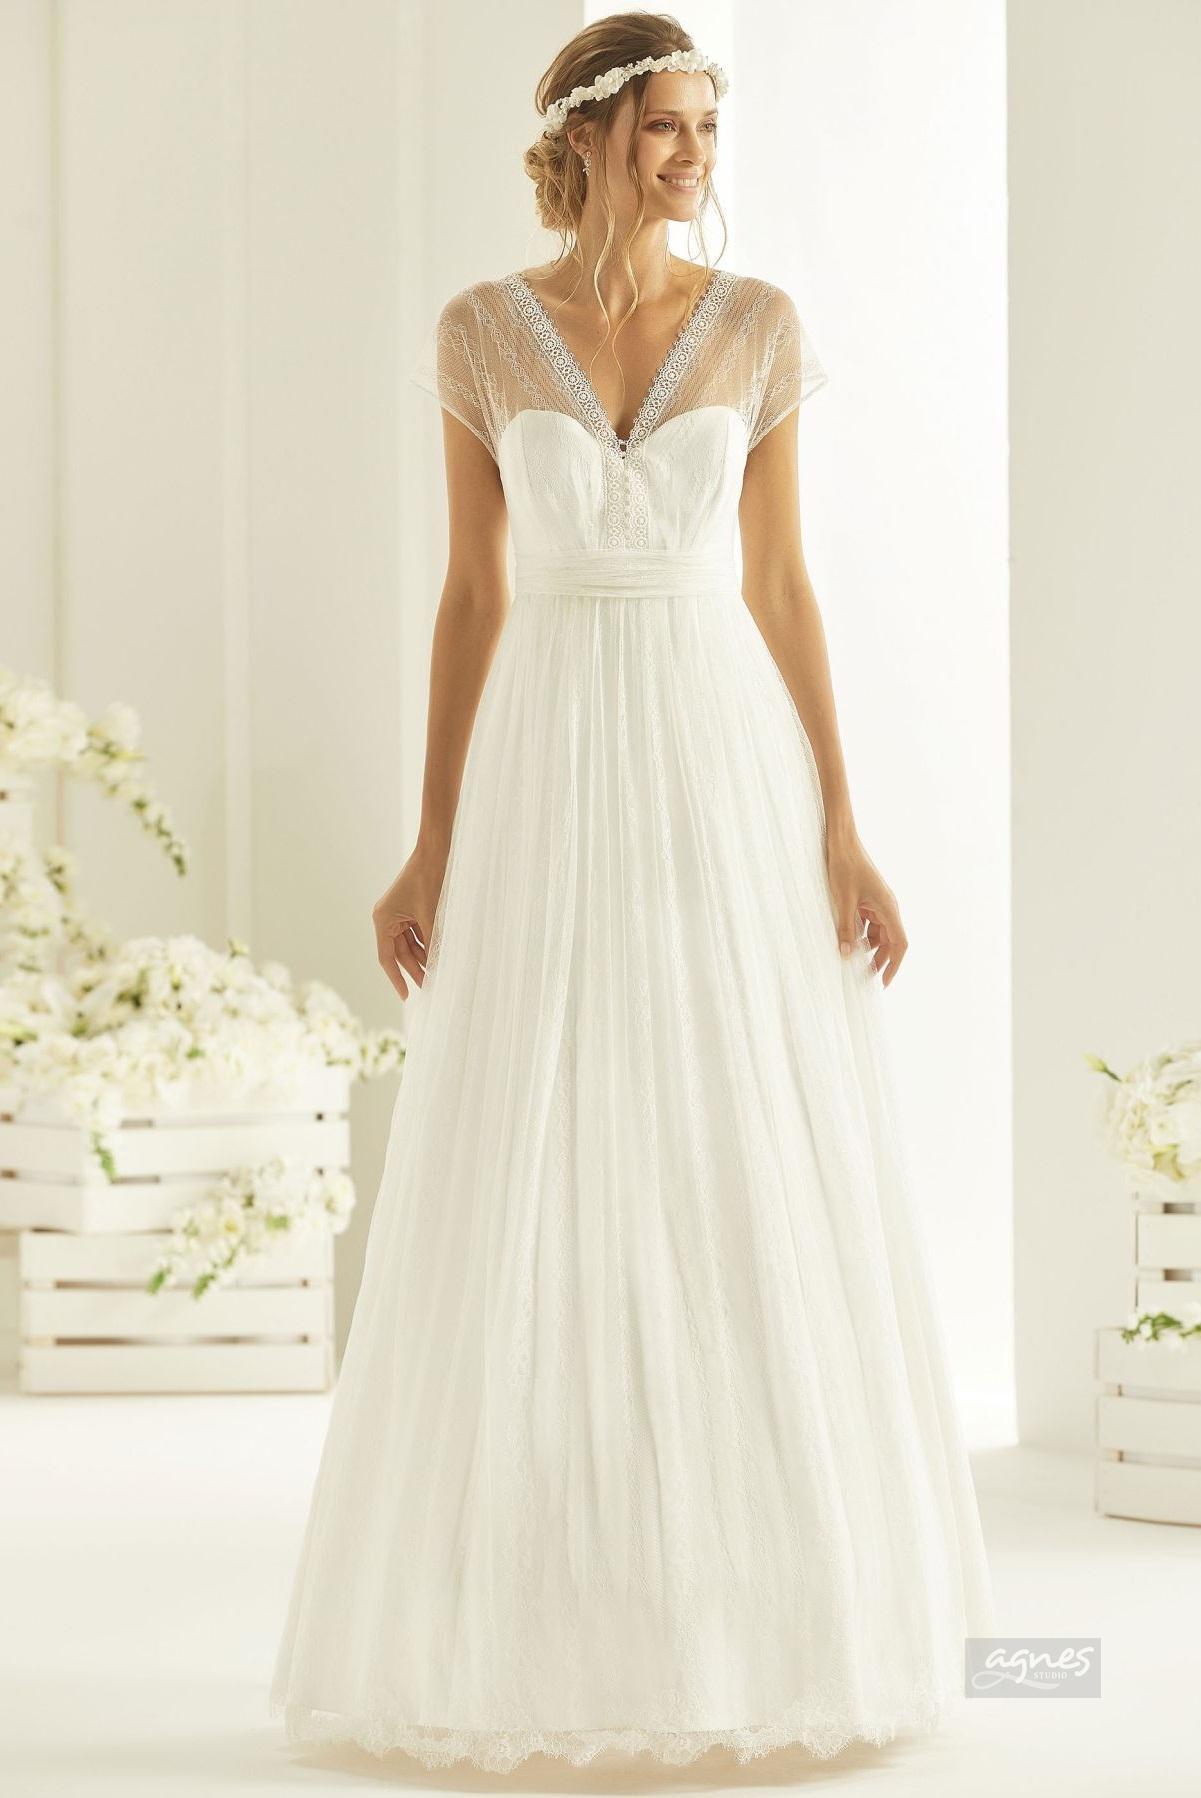 COSMA-(1) Bianco-Evento-bridal-dress-studioagnes